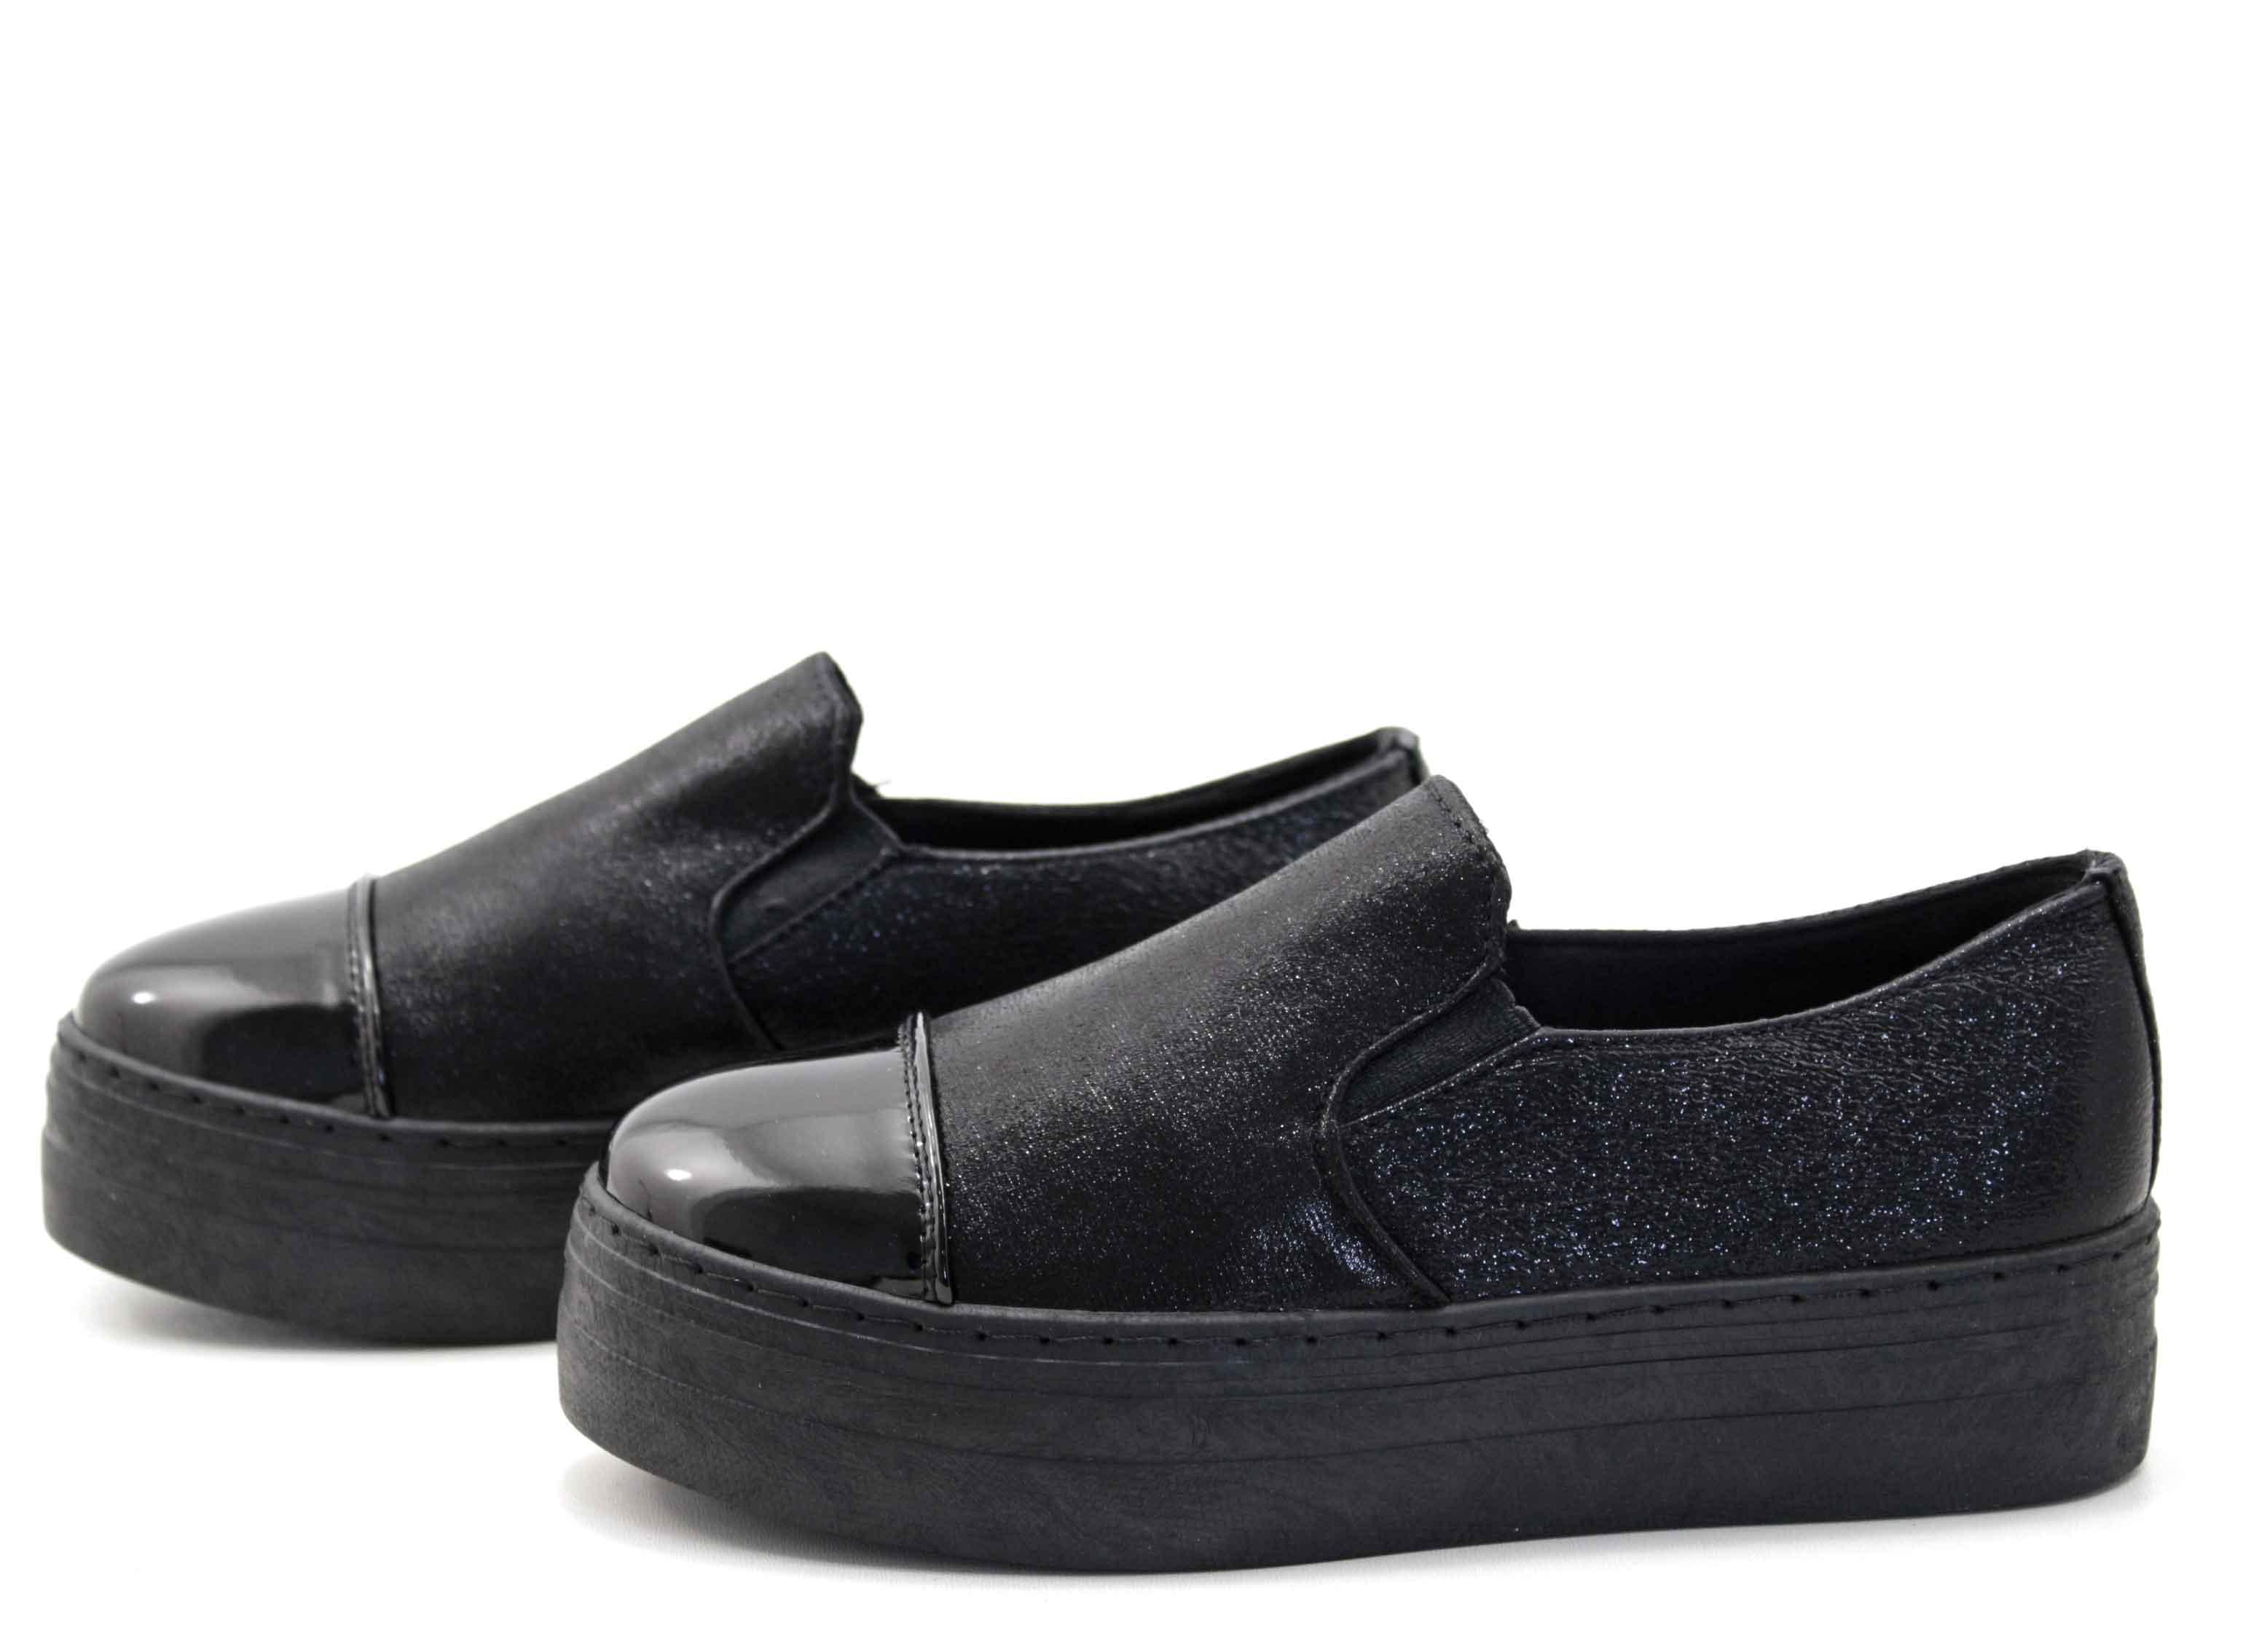 9026152db3a ΓΥΝΑΙΚΕΙΑ ΠΑΠΟΥΤΣΙΑ CASUAL ΜΑΥΡΑ - Sneakers - Πάνινα, Casual-Oxford ...